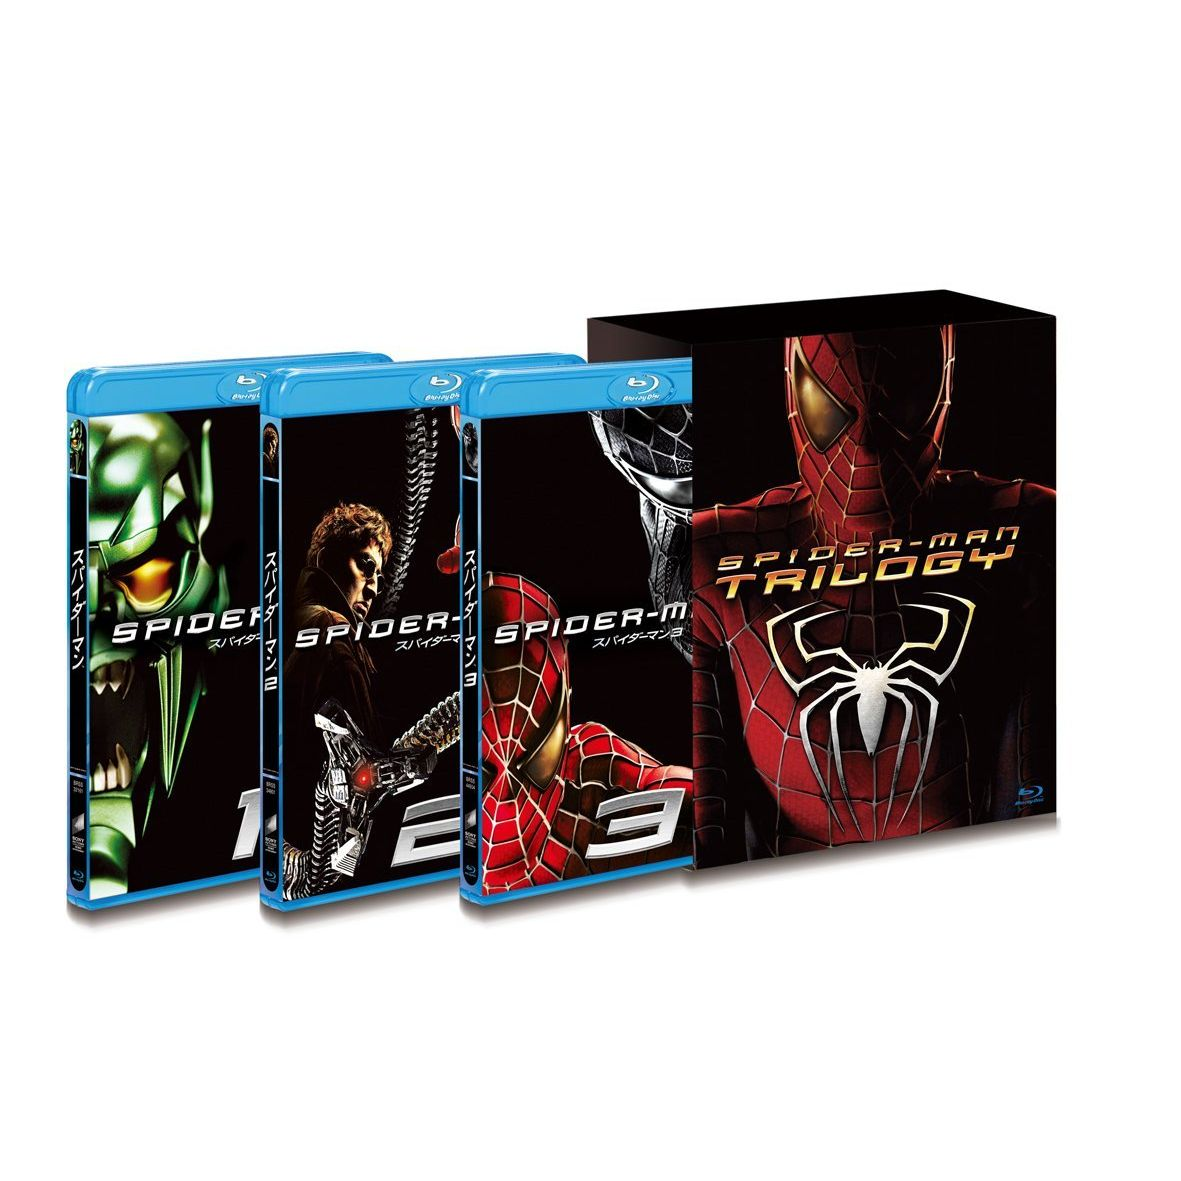 Blu-ray スパイダーマンTM トリロジーボックス[BPBH-660][Blu-ray/ブルーレイ]